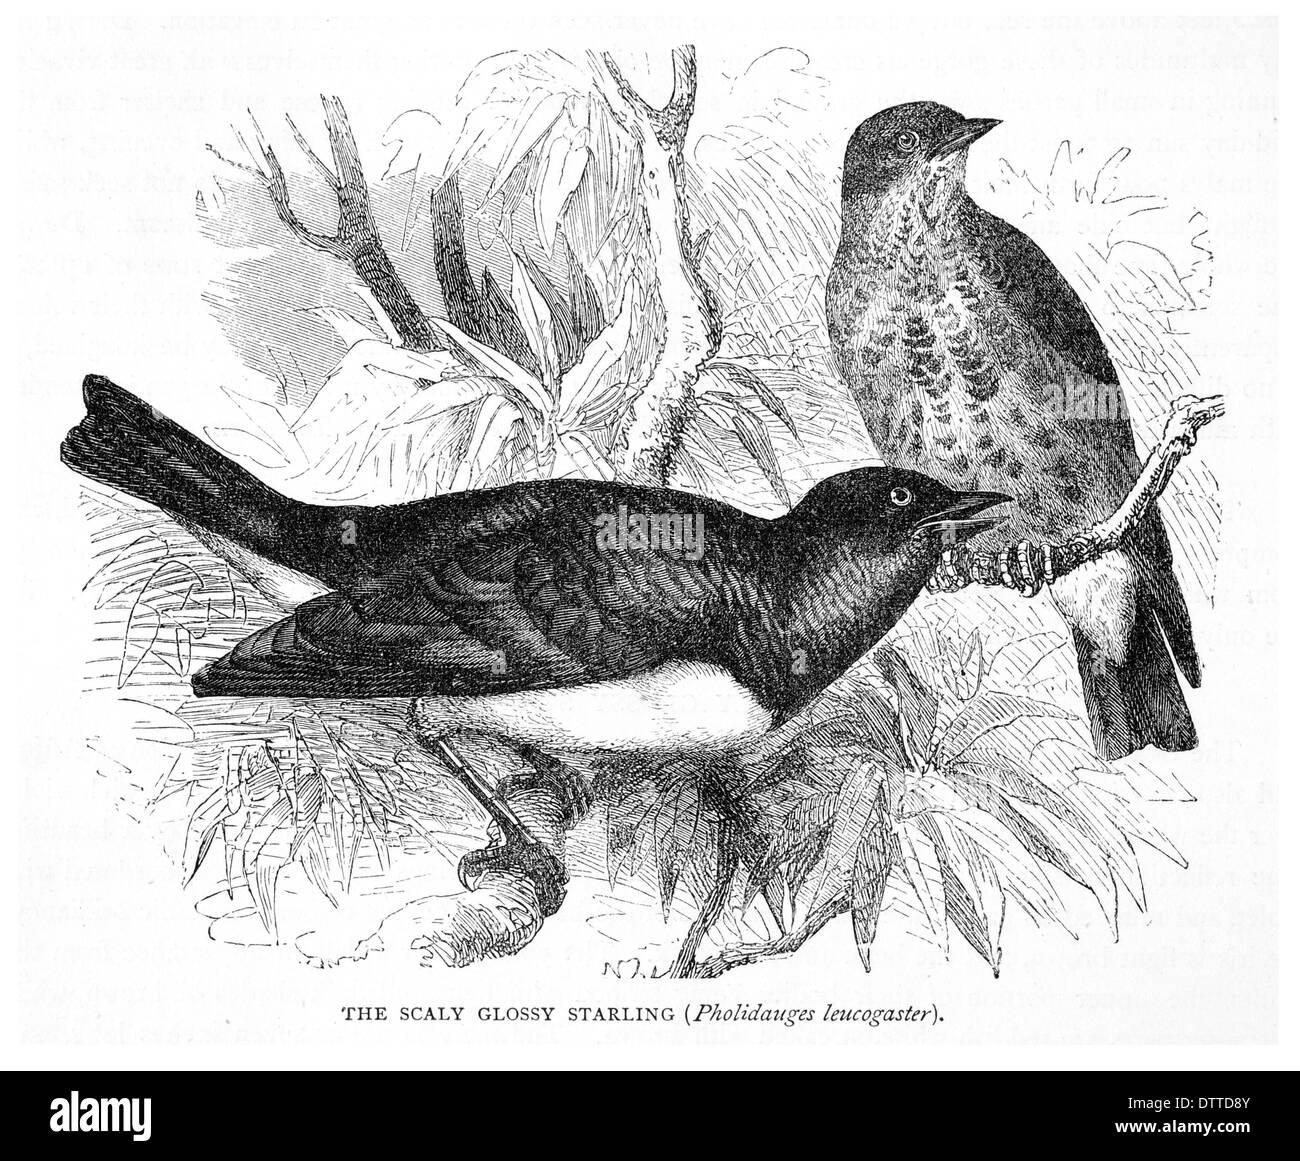 Satinado escamoso Starling Pholidauges leucogaster Imagen De Stock